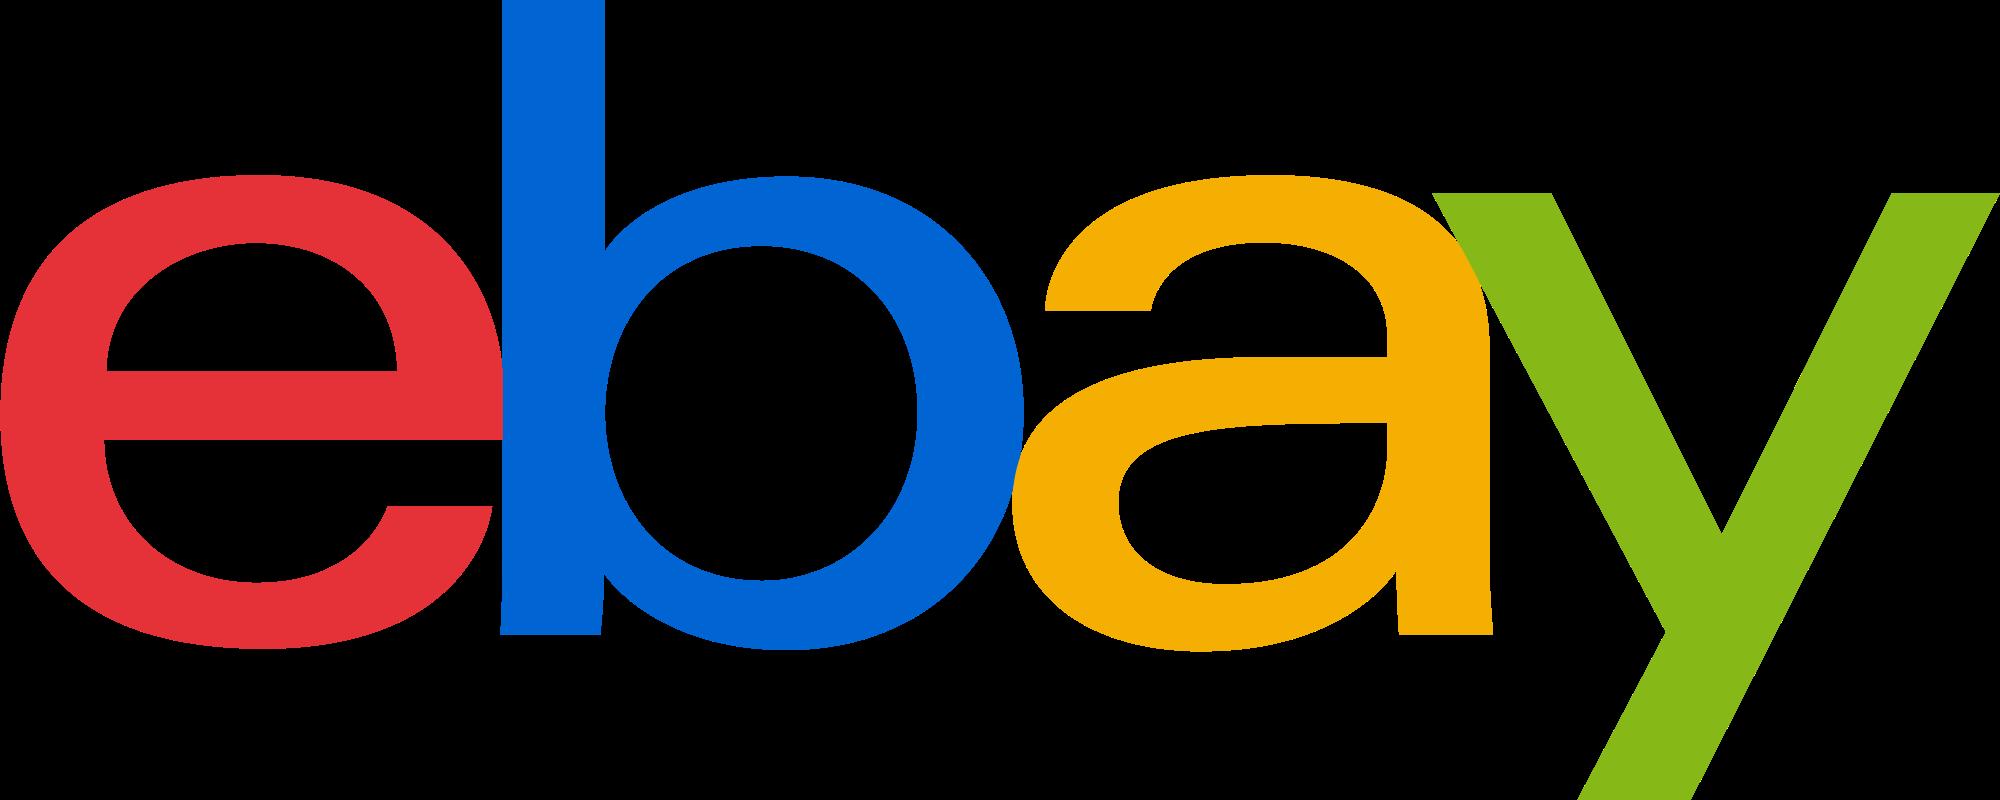 Ebay-Logo-Wallpaper-5.png